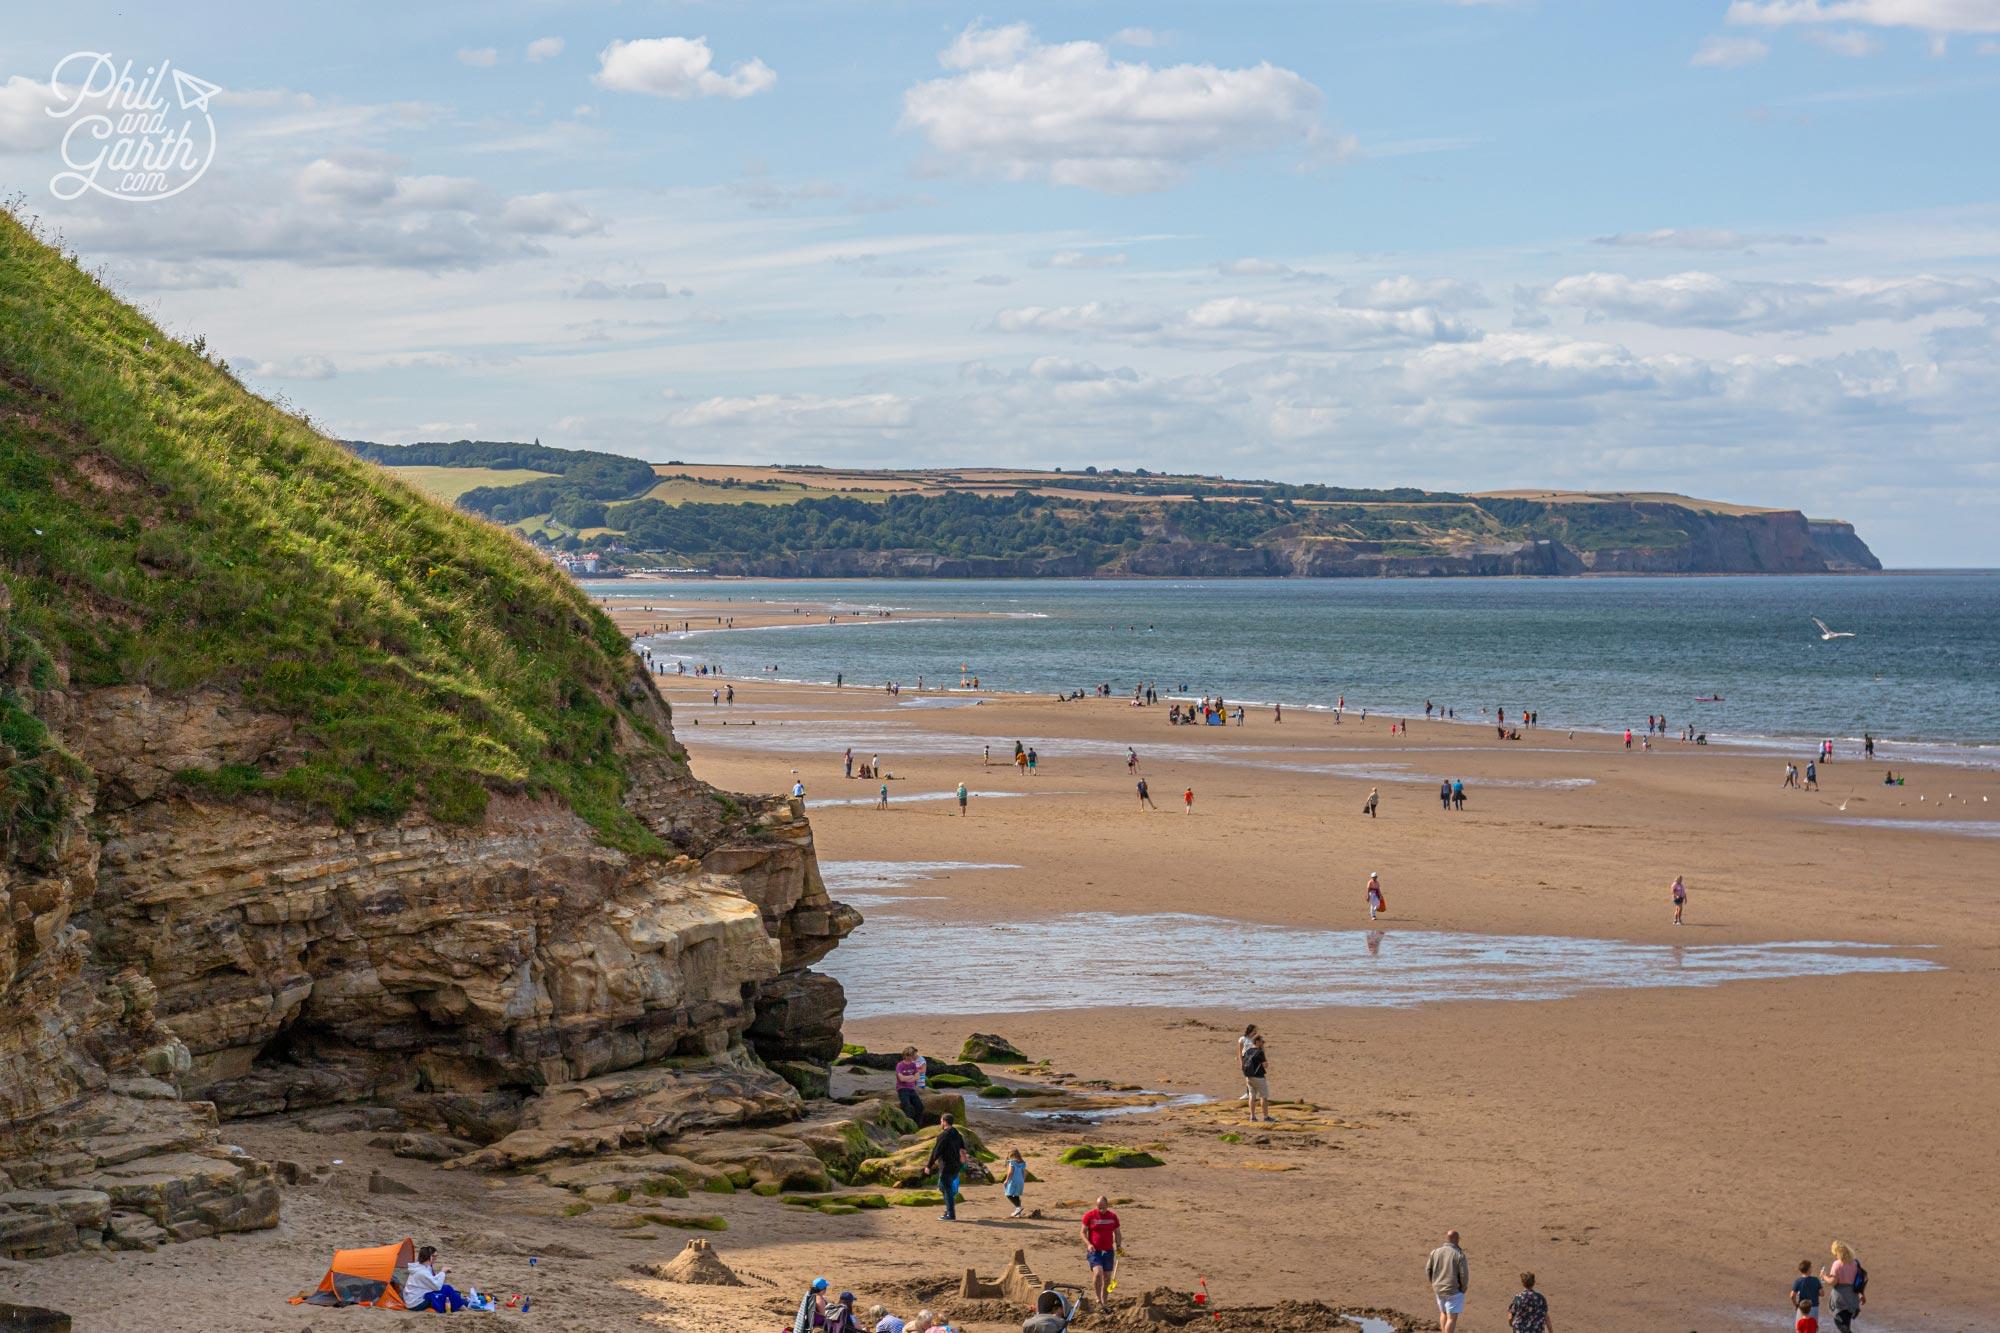 Whitby's golden sandy beach